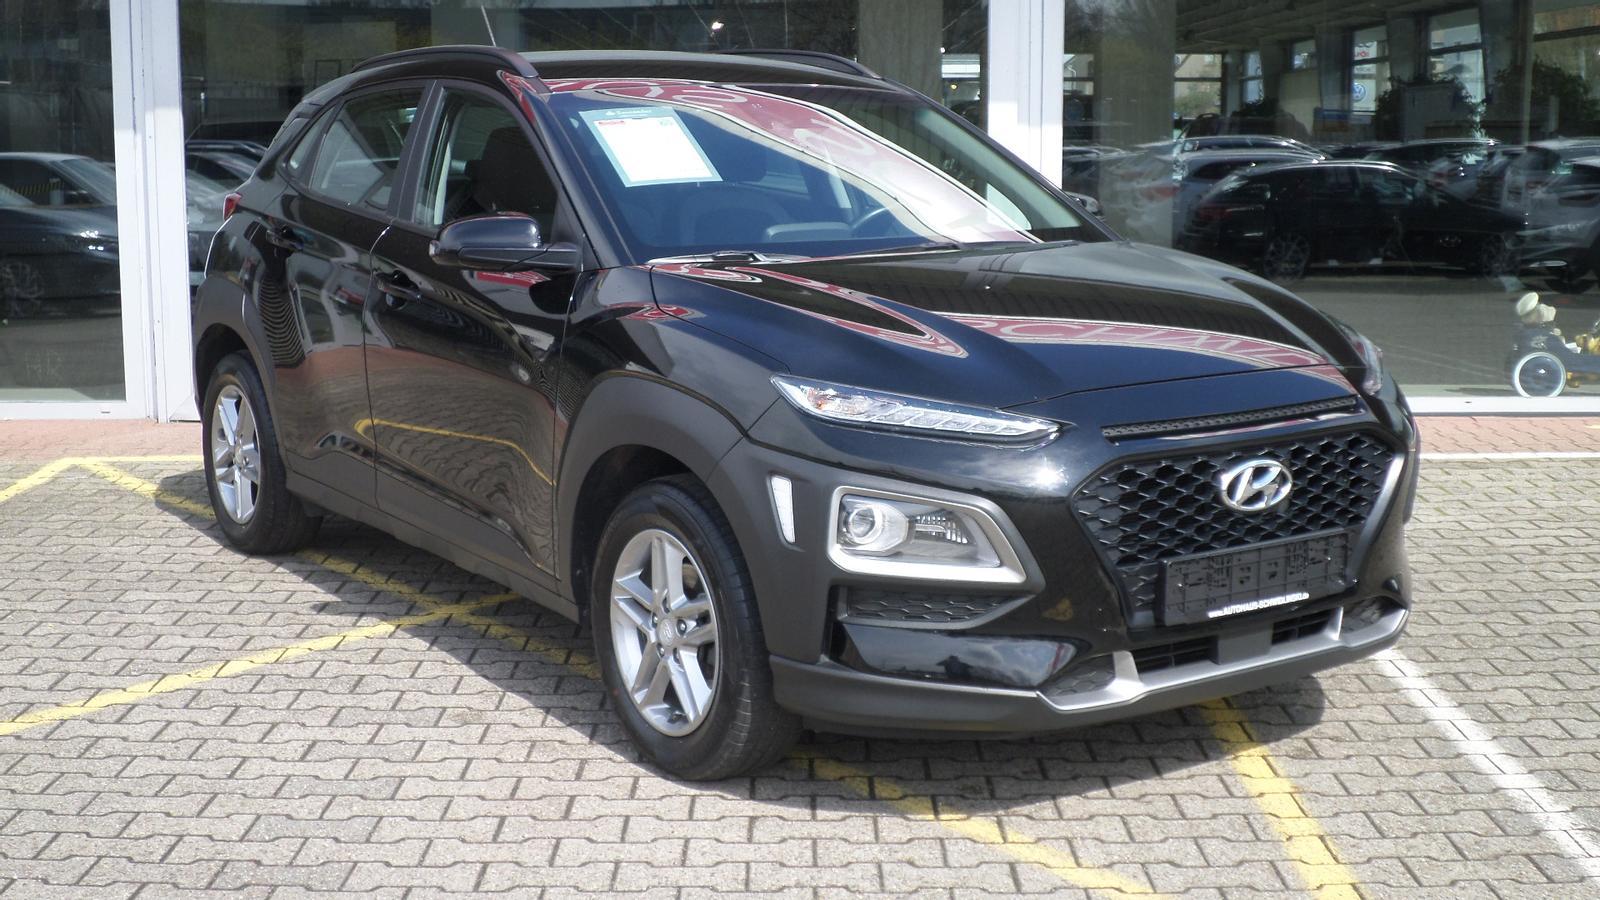 Hyundai Kona 1.0 KAMERA KLIMA SHZ 41.924 KM 1. HAND, Jahr 2018, Benzin